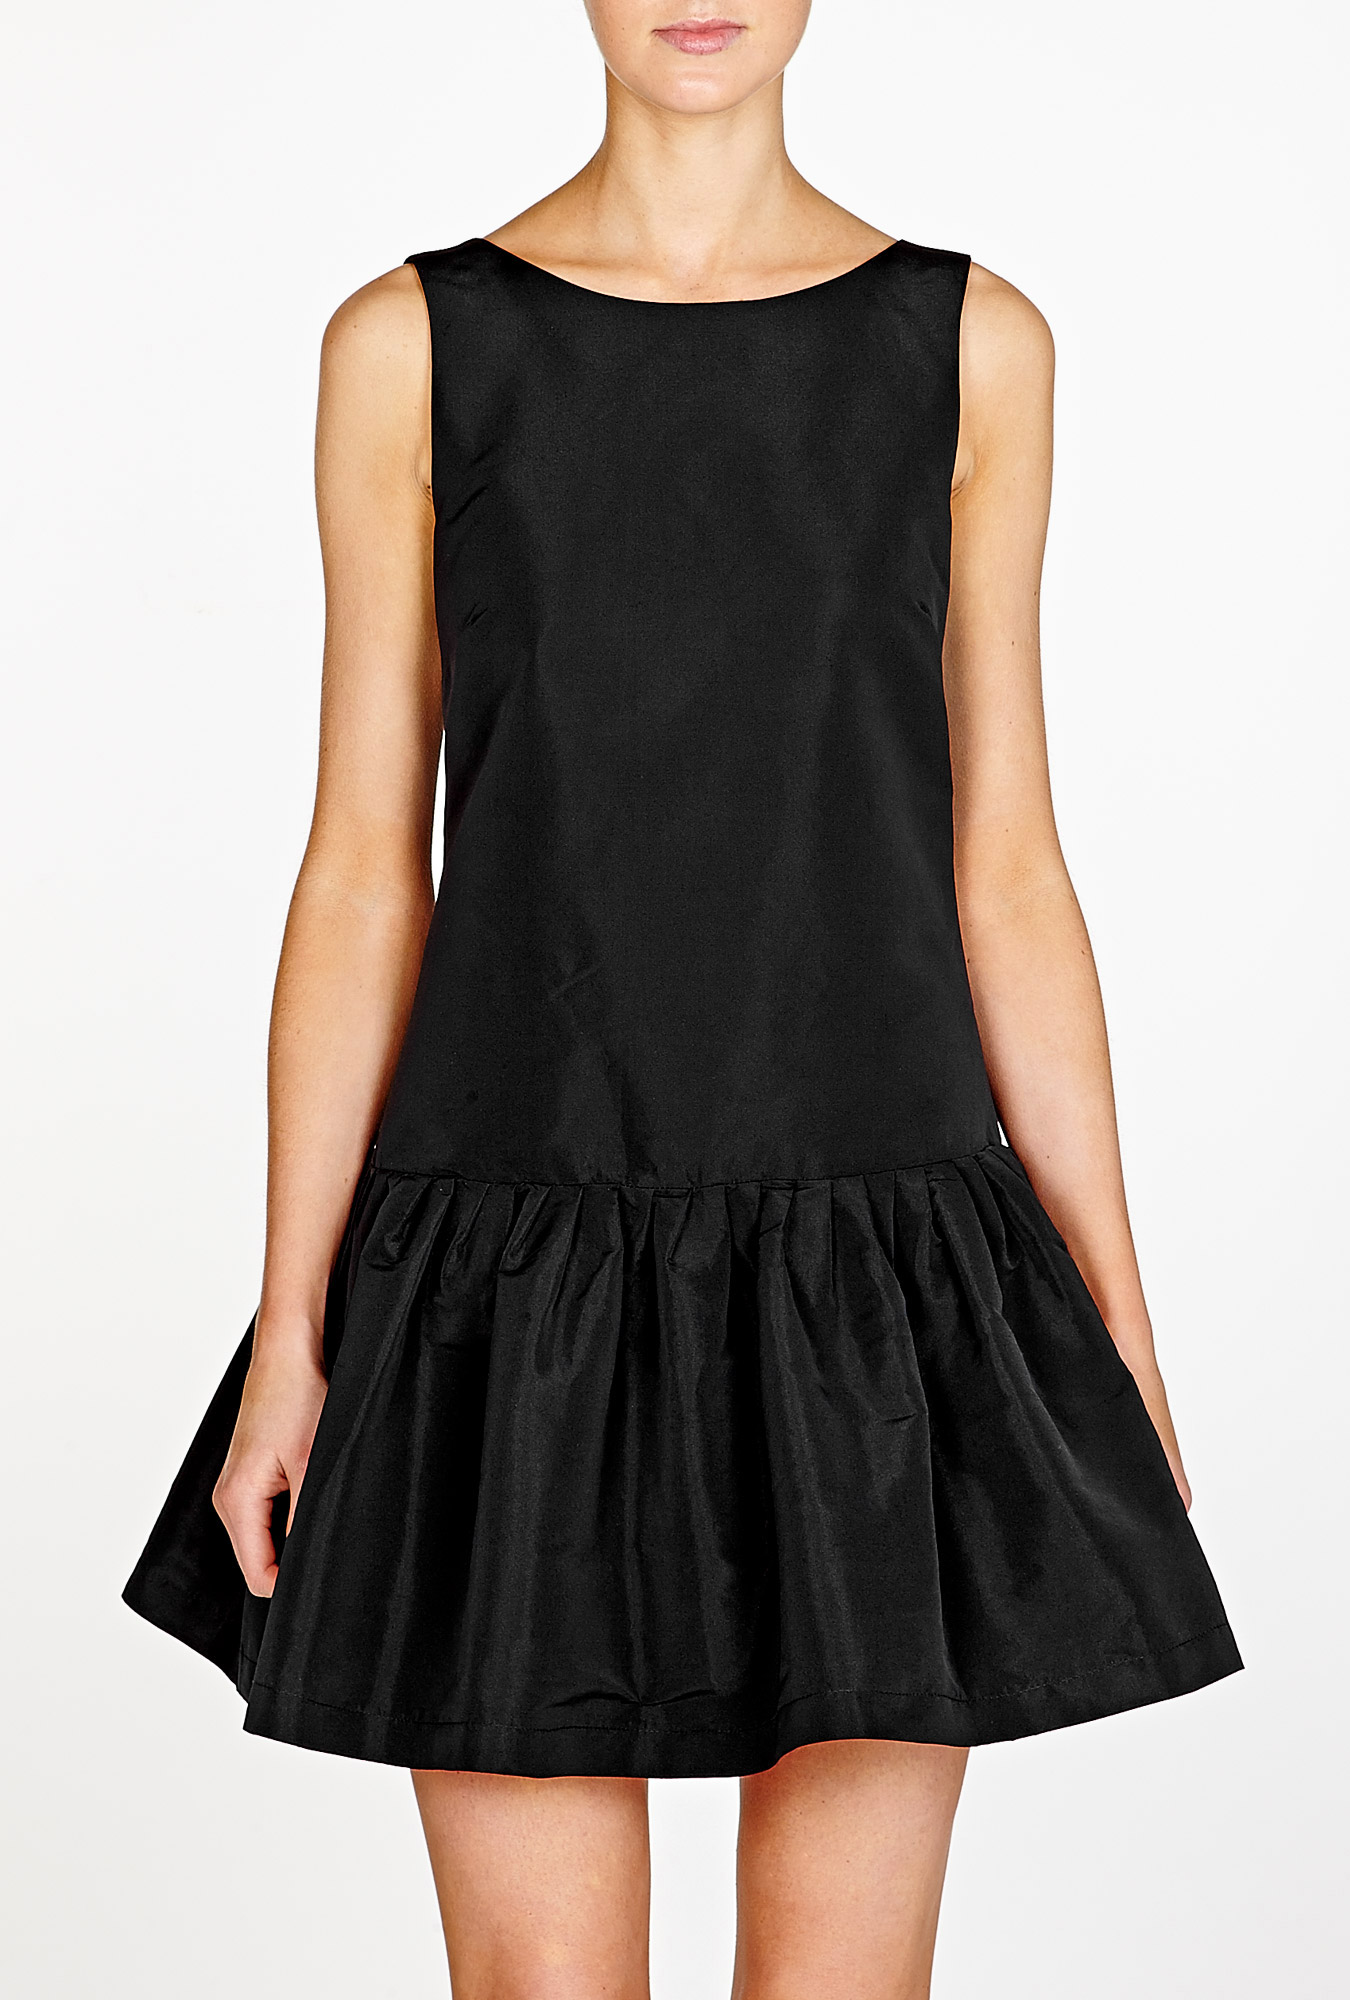 Black Drop Waist Dress Dressedupgirl Com